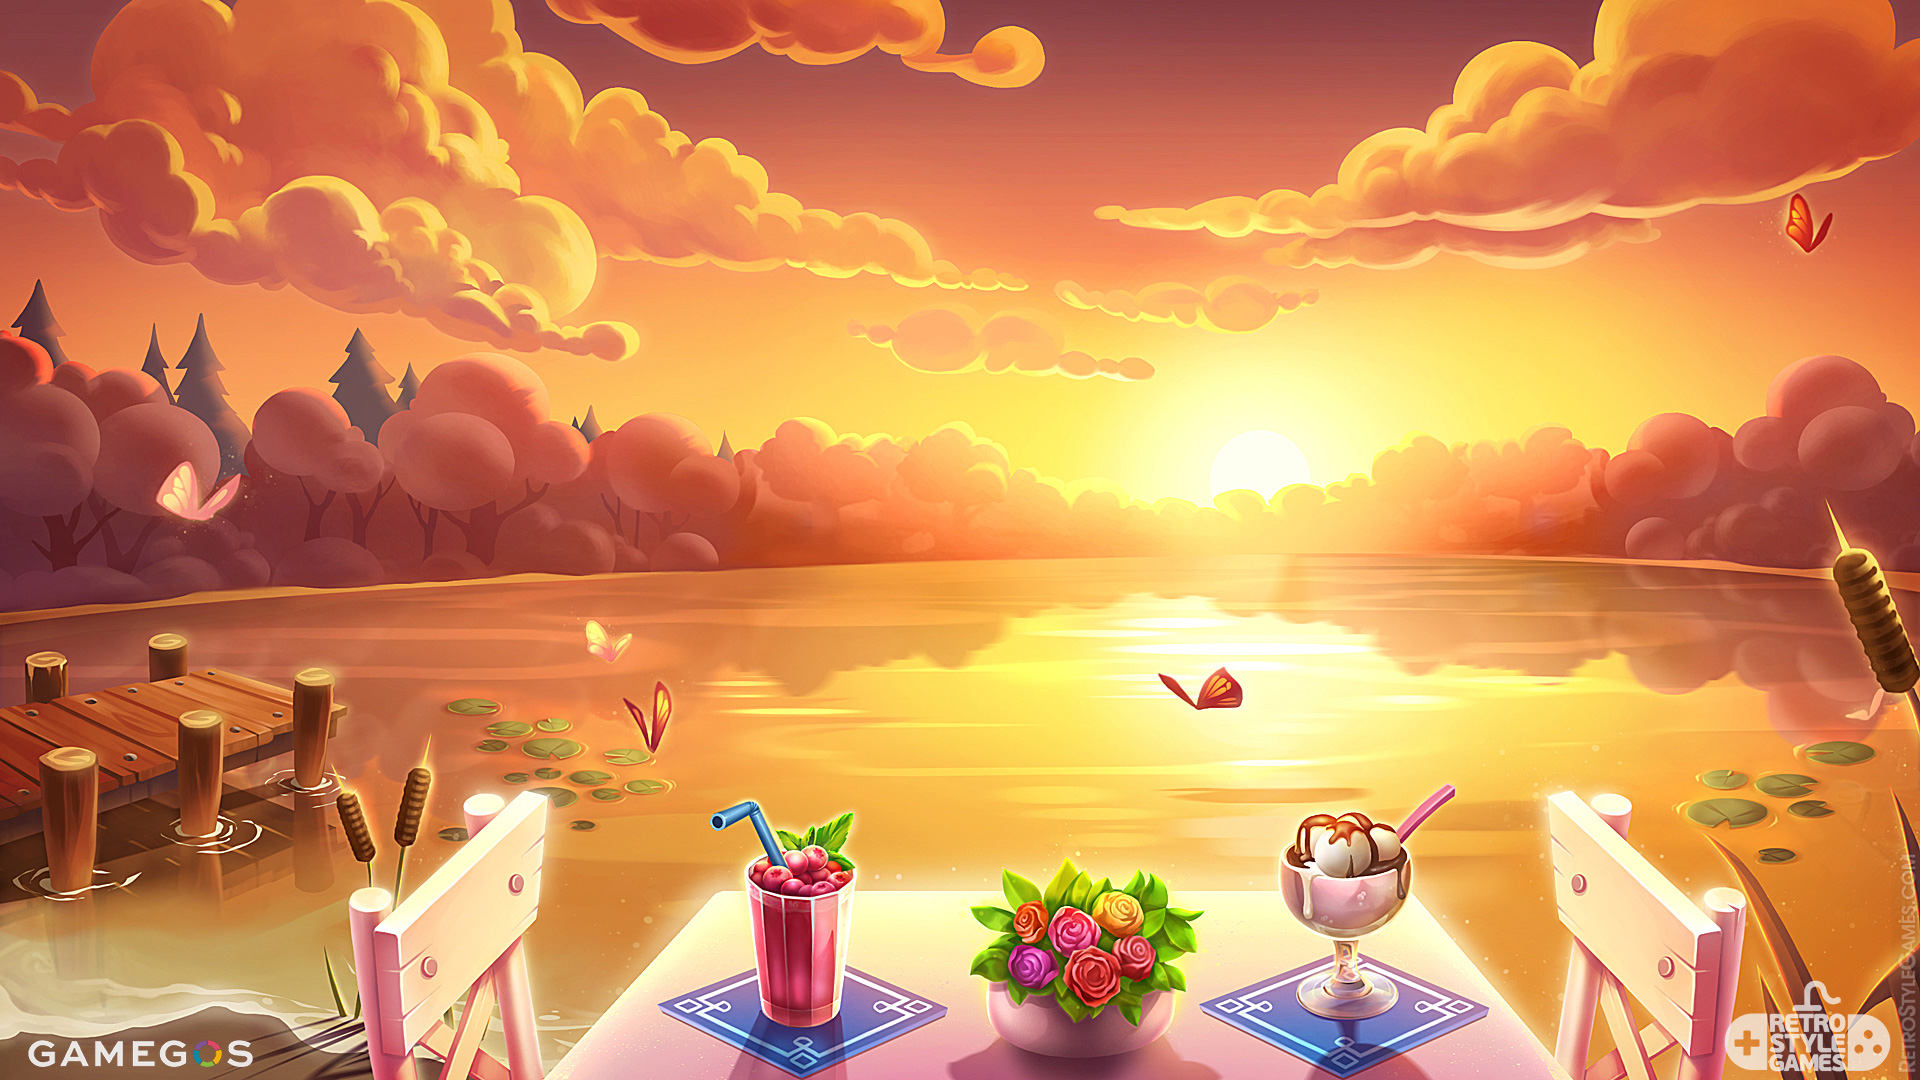 2D Illustration Game Background Shore Lake